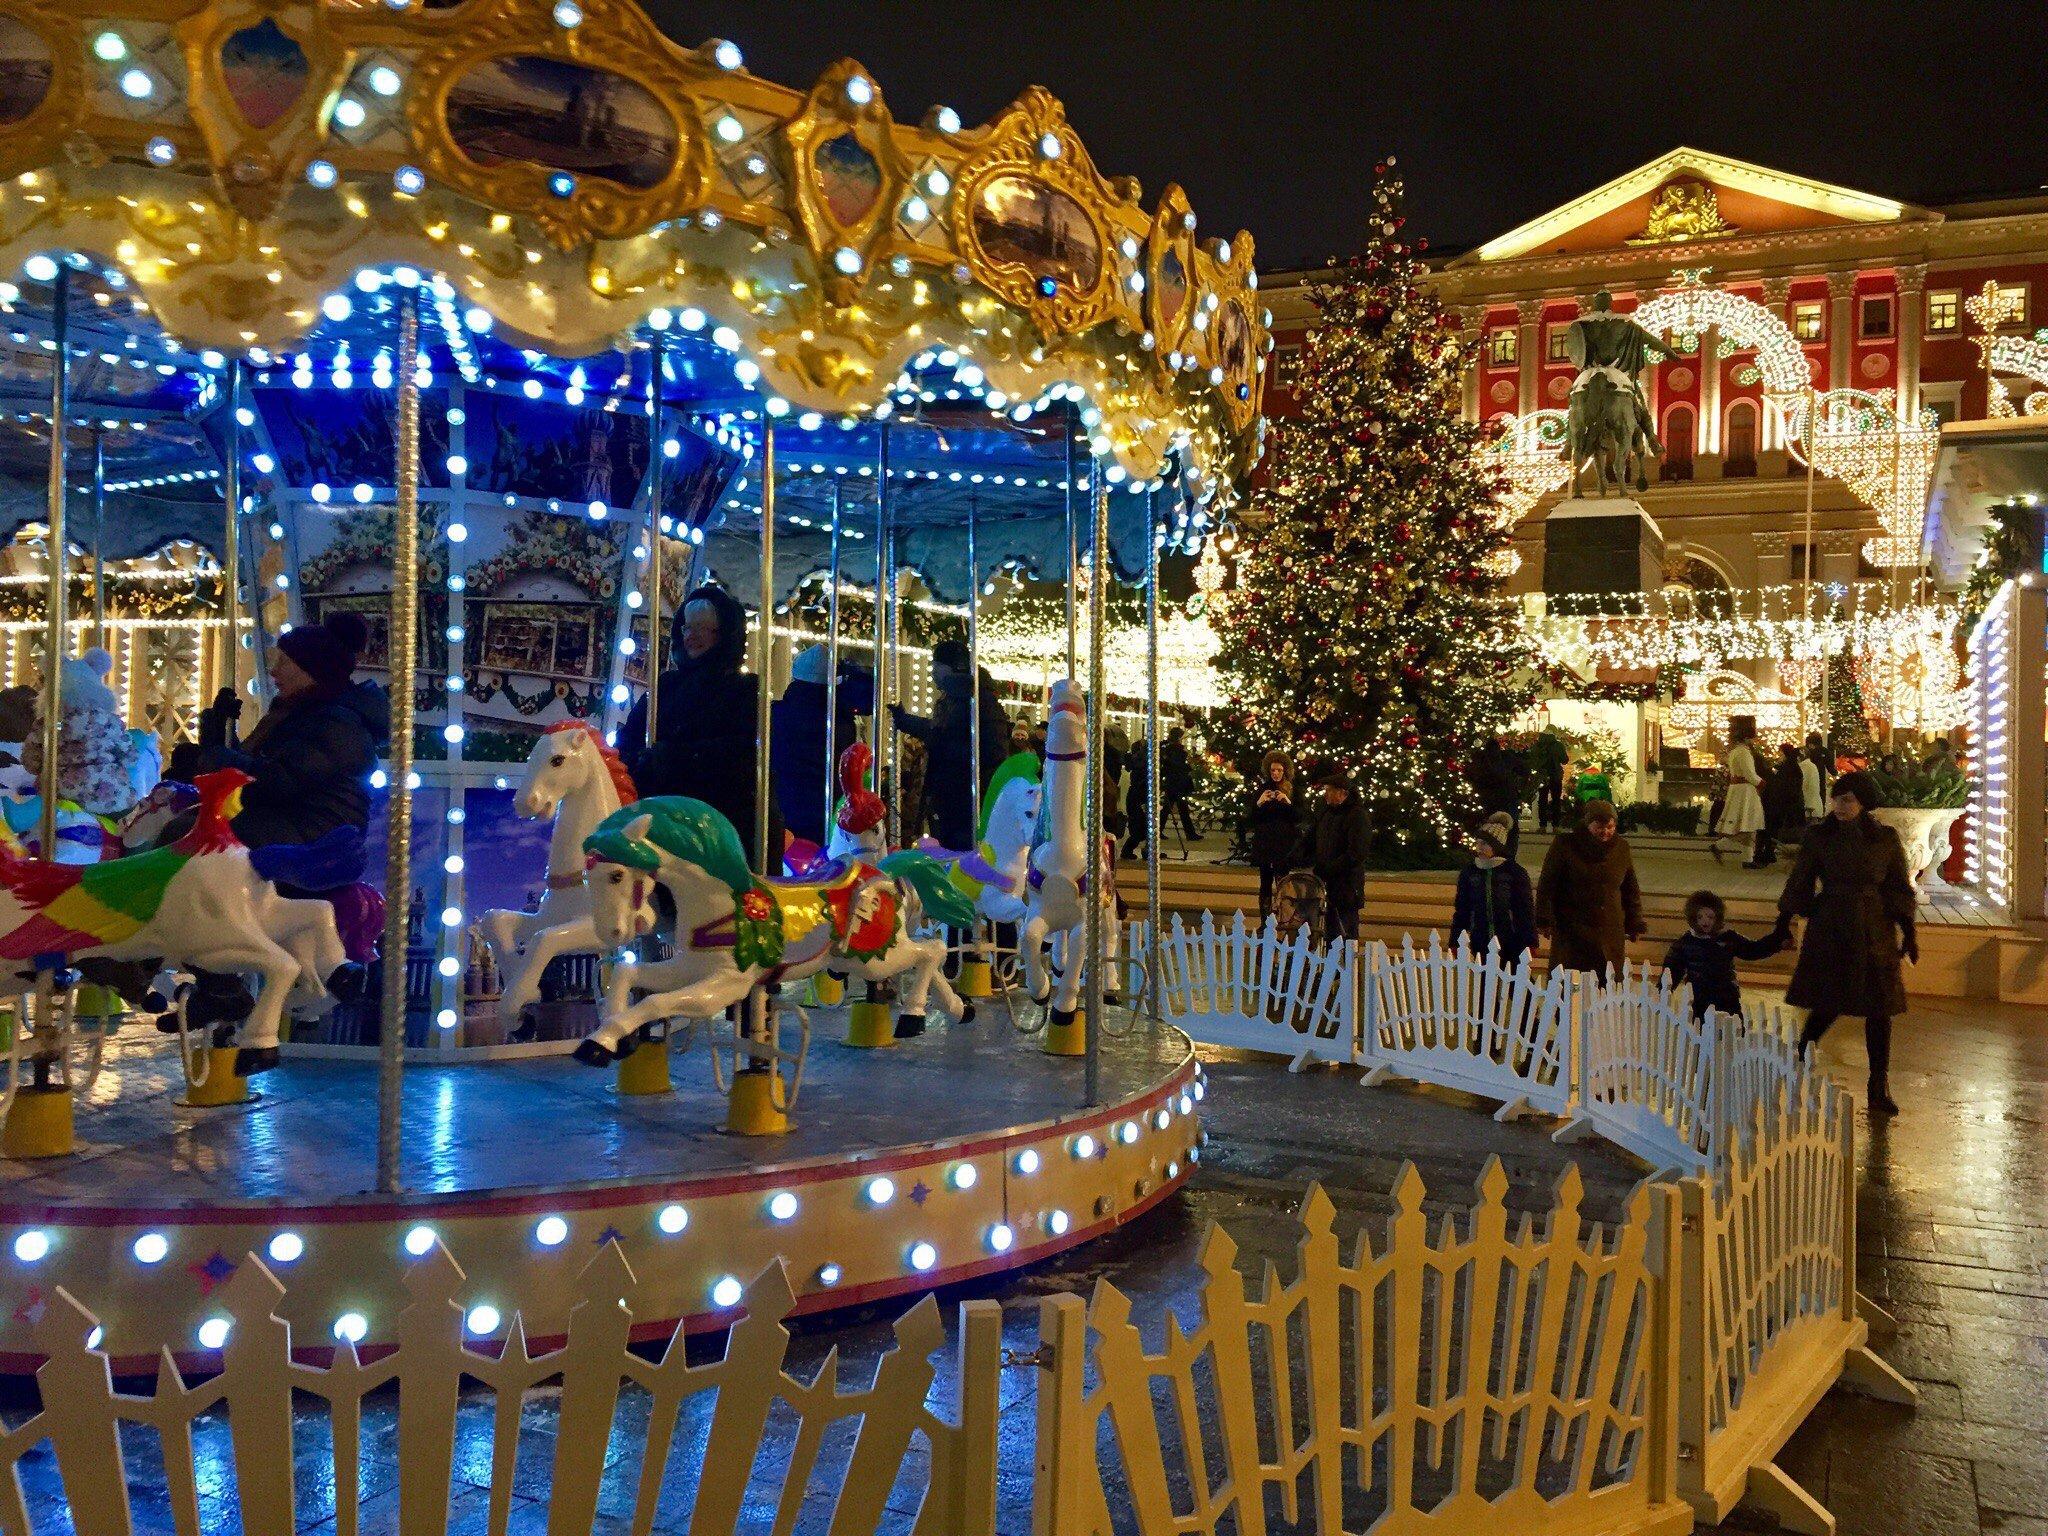 фестиваль рождество москва фото влиянием